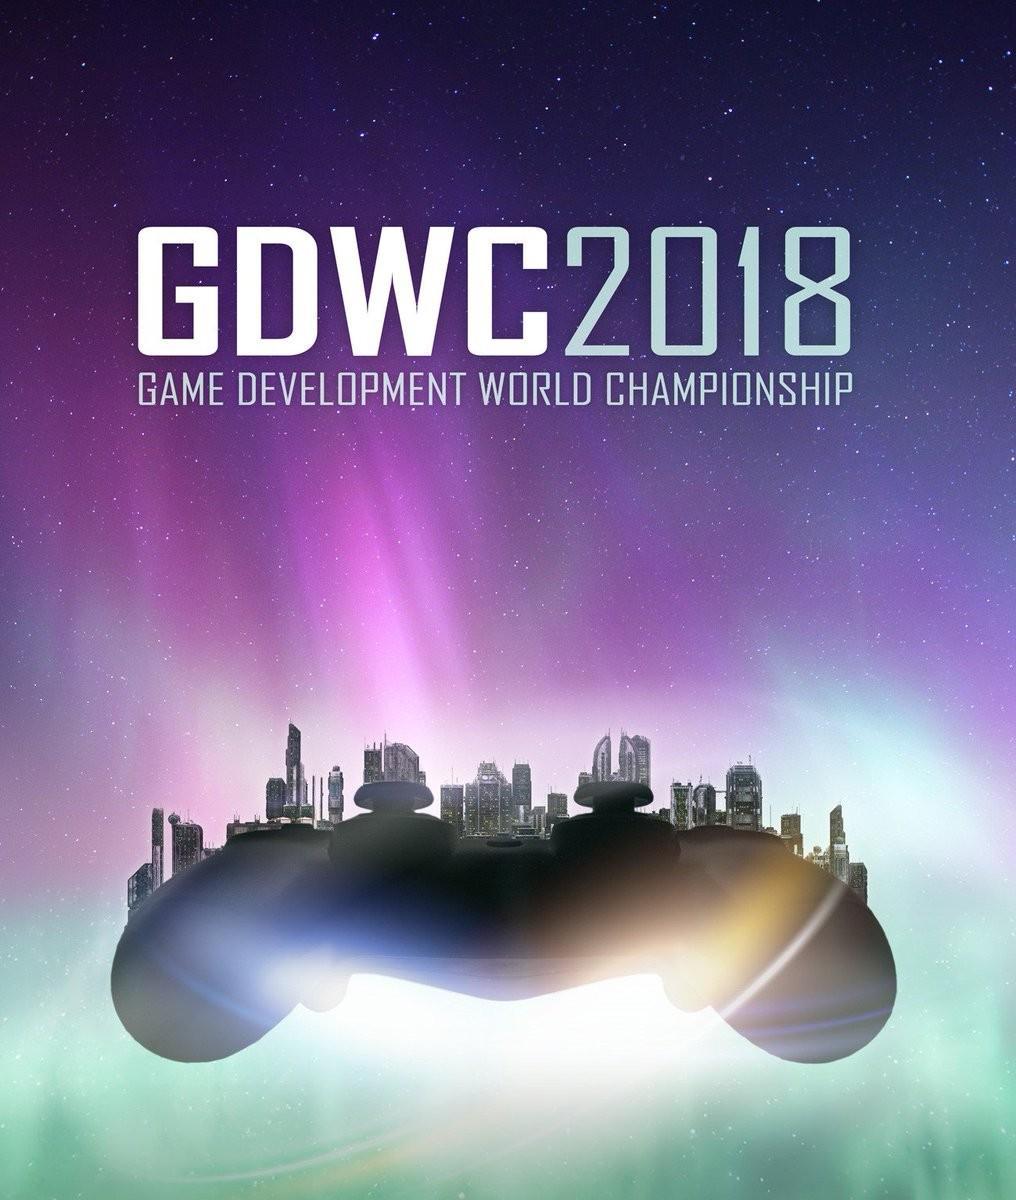 GDWC 2018